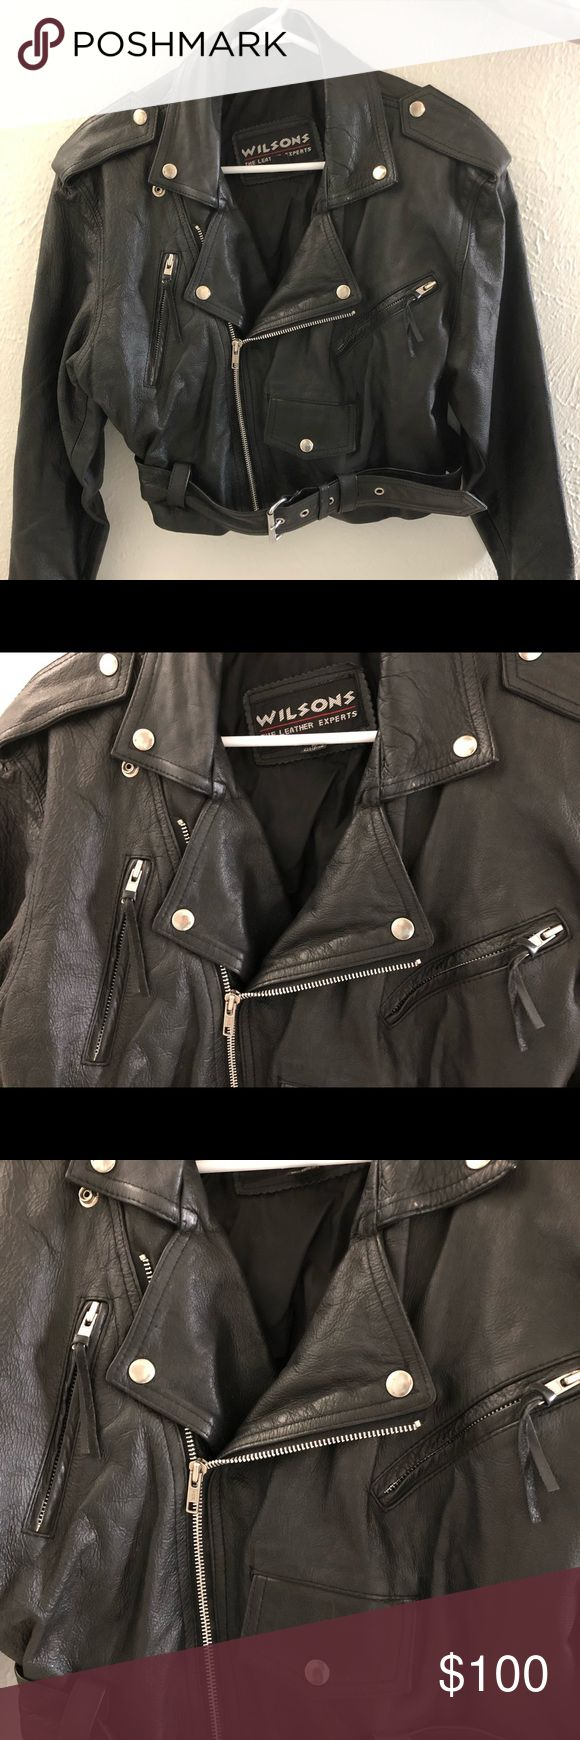 Wilson's Womens Leather Jacket Leather jackets women